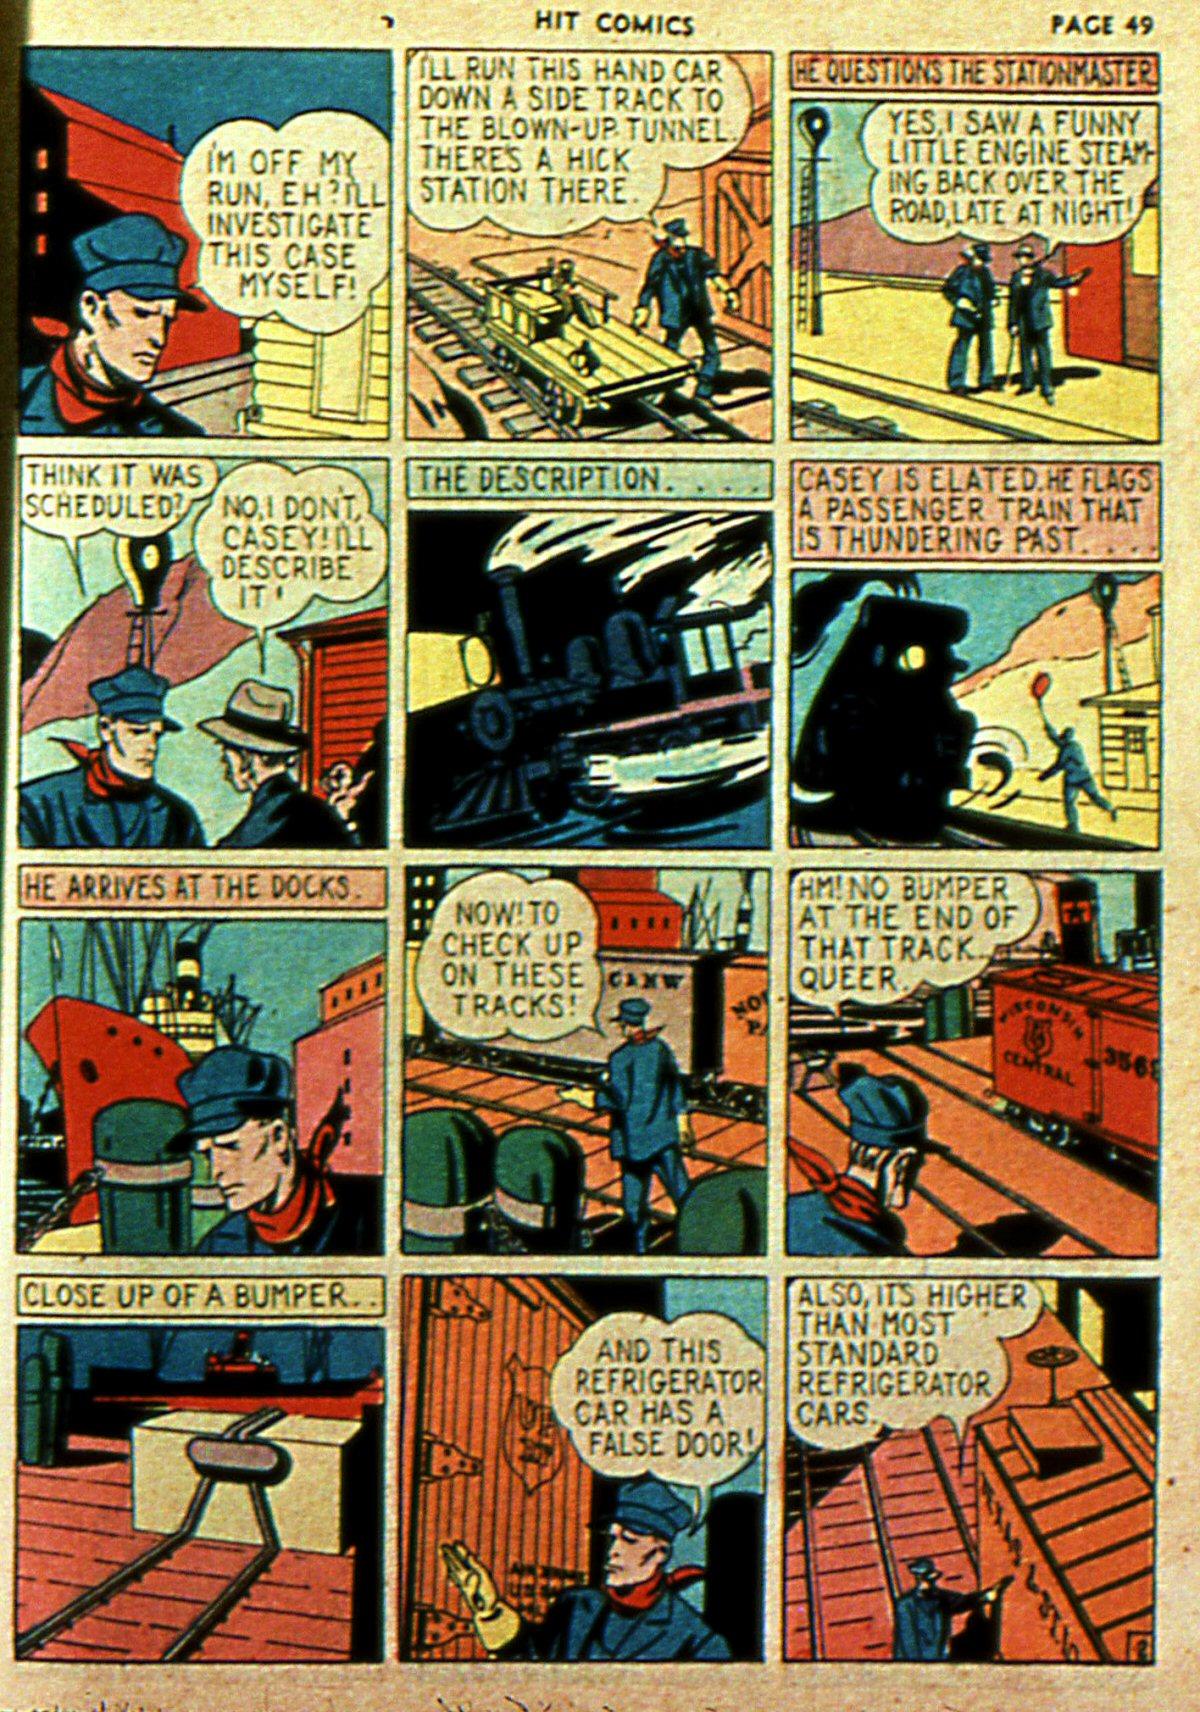 Read online Hit Comics comic -  Issue #2 - 51